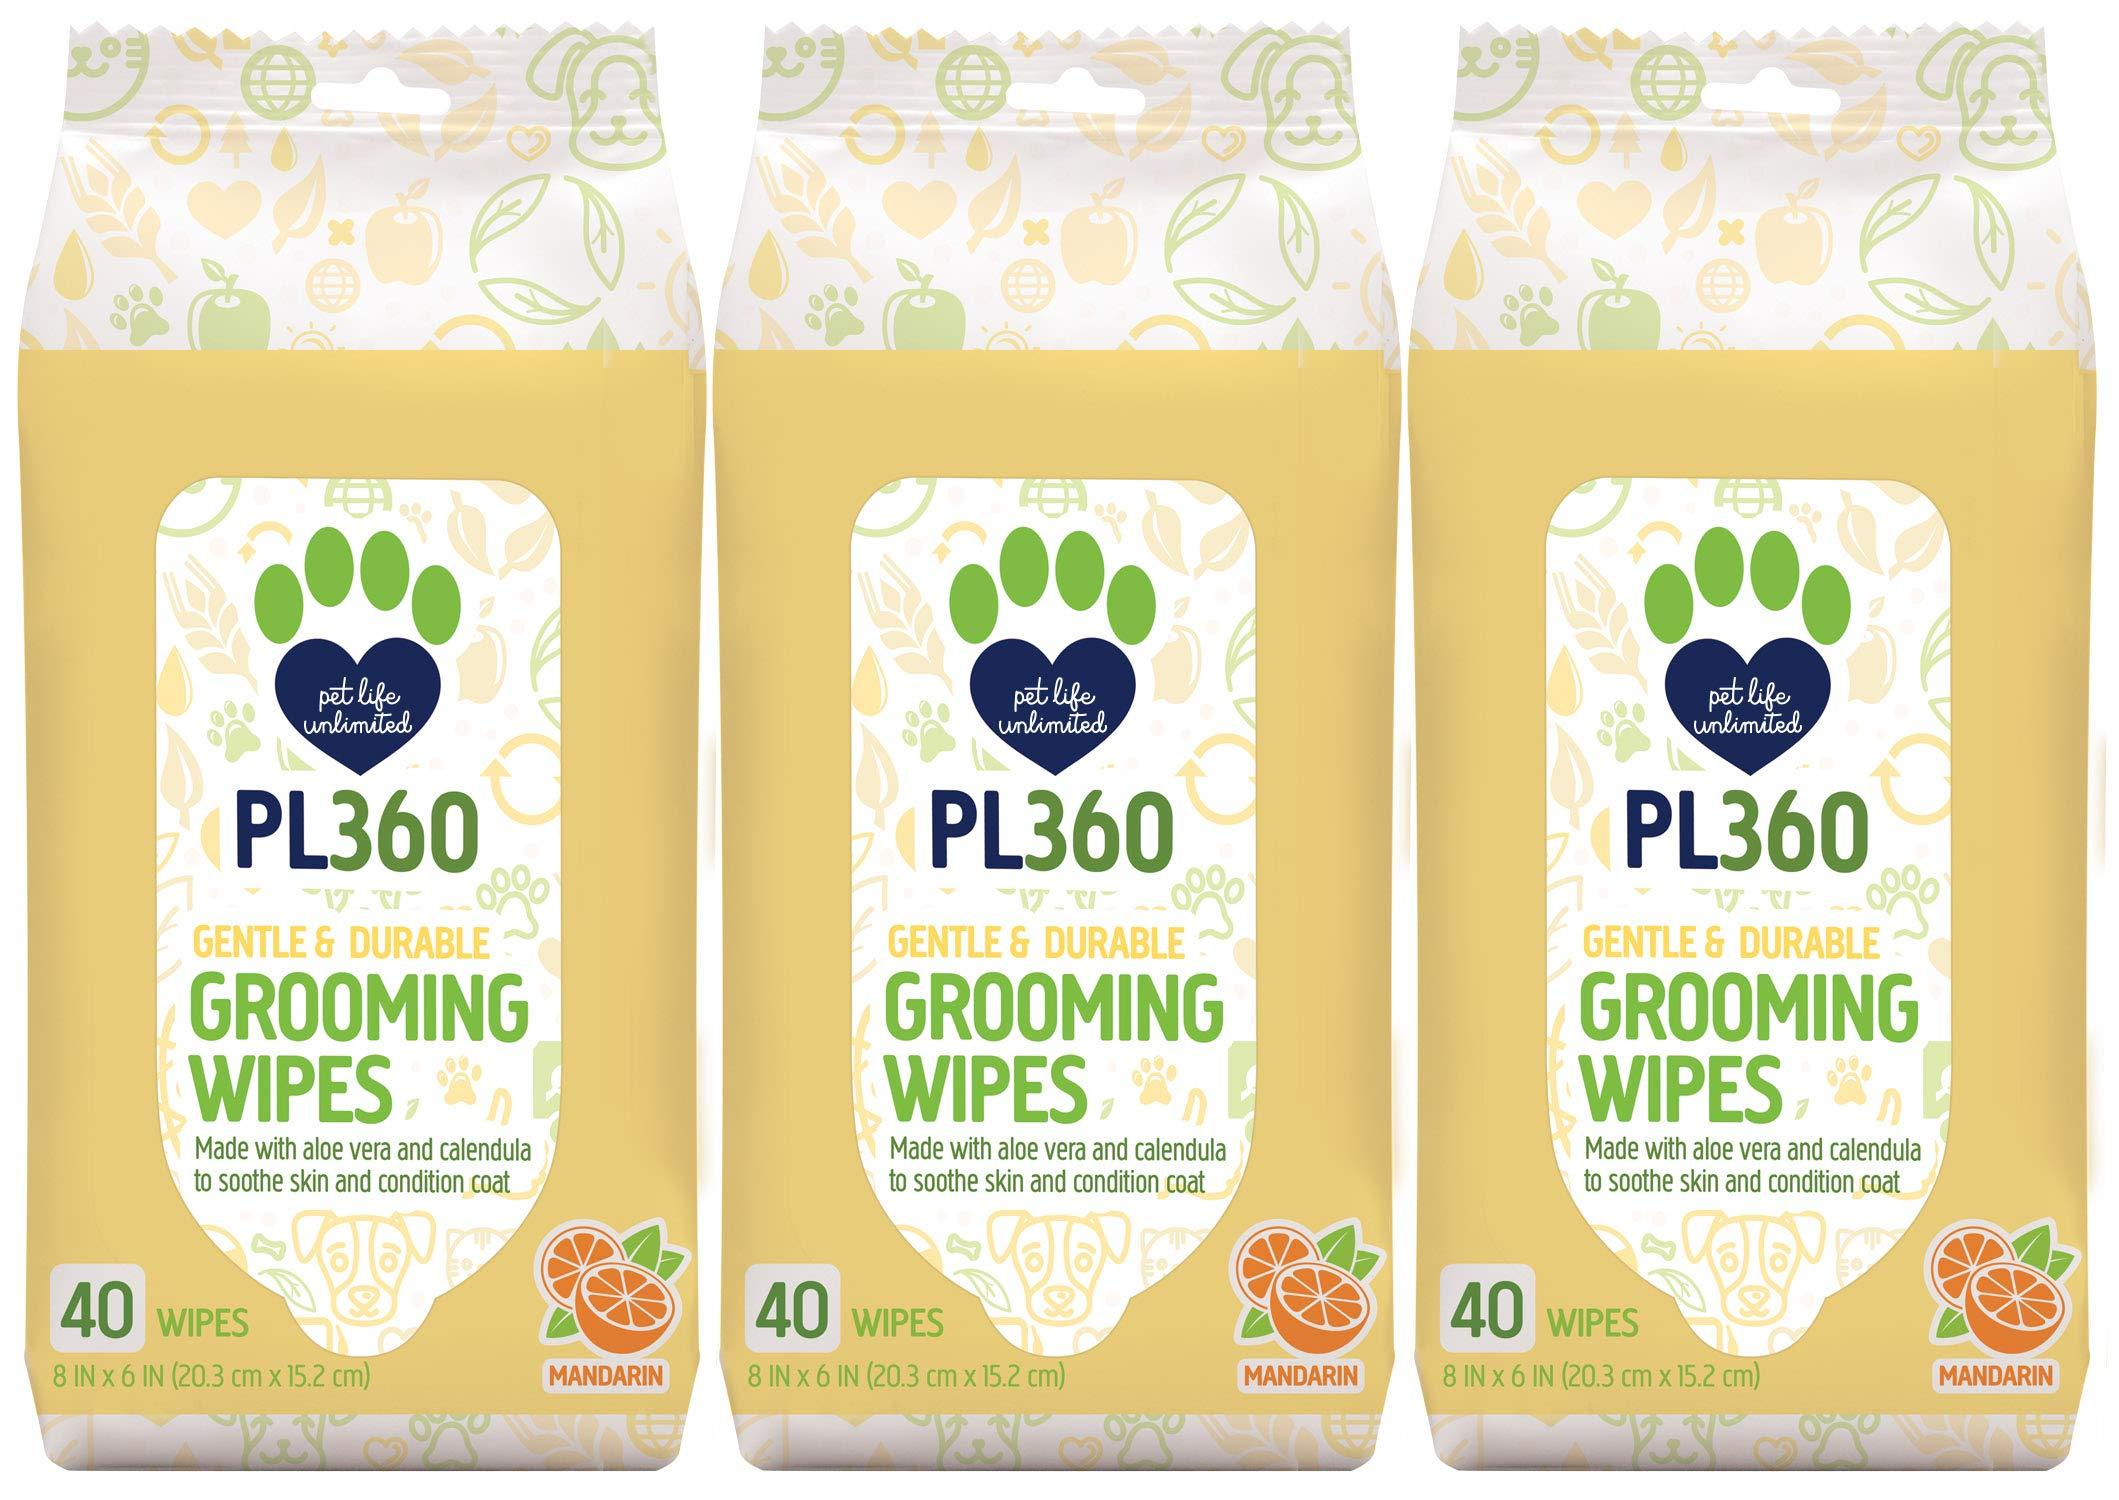 PL360 Dog Grooming Wipes, Mandarin